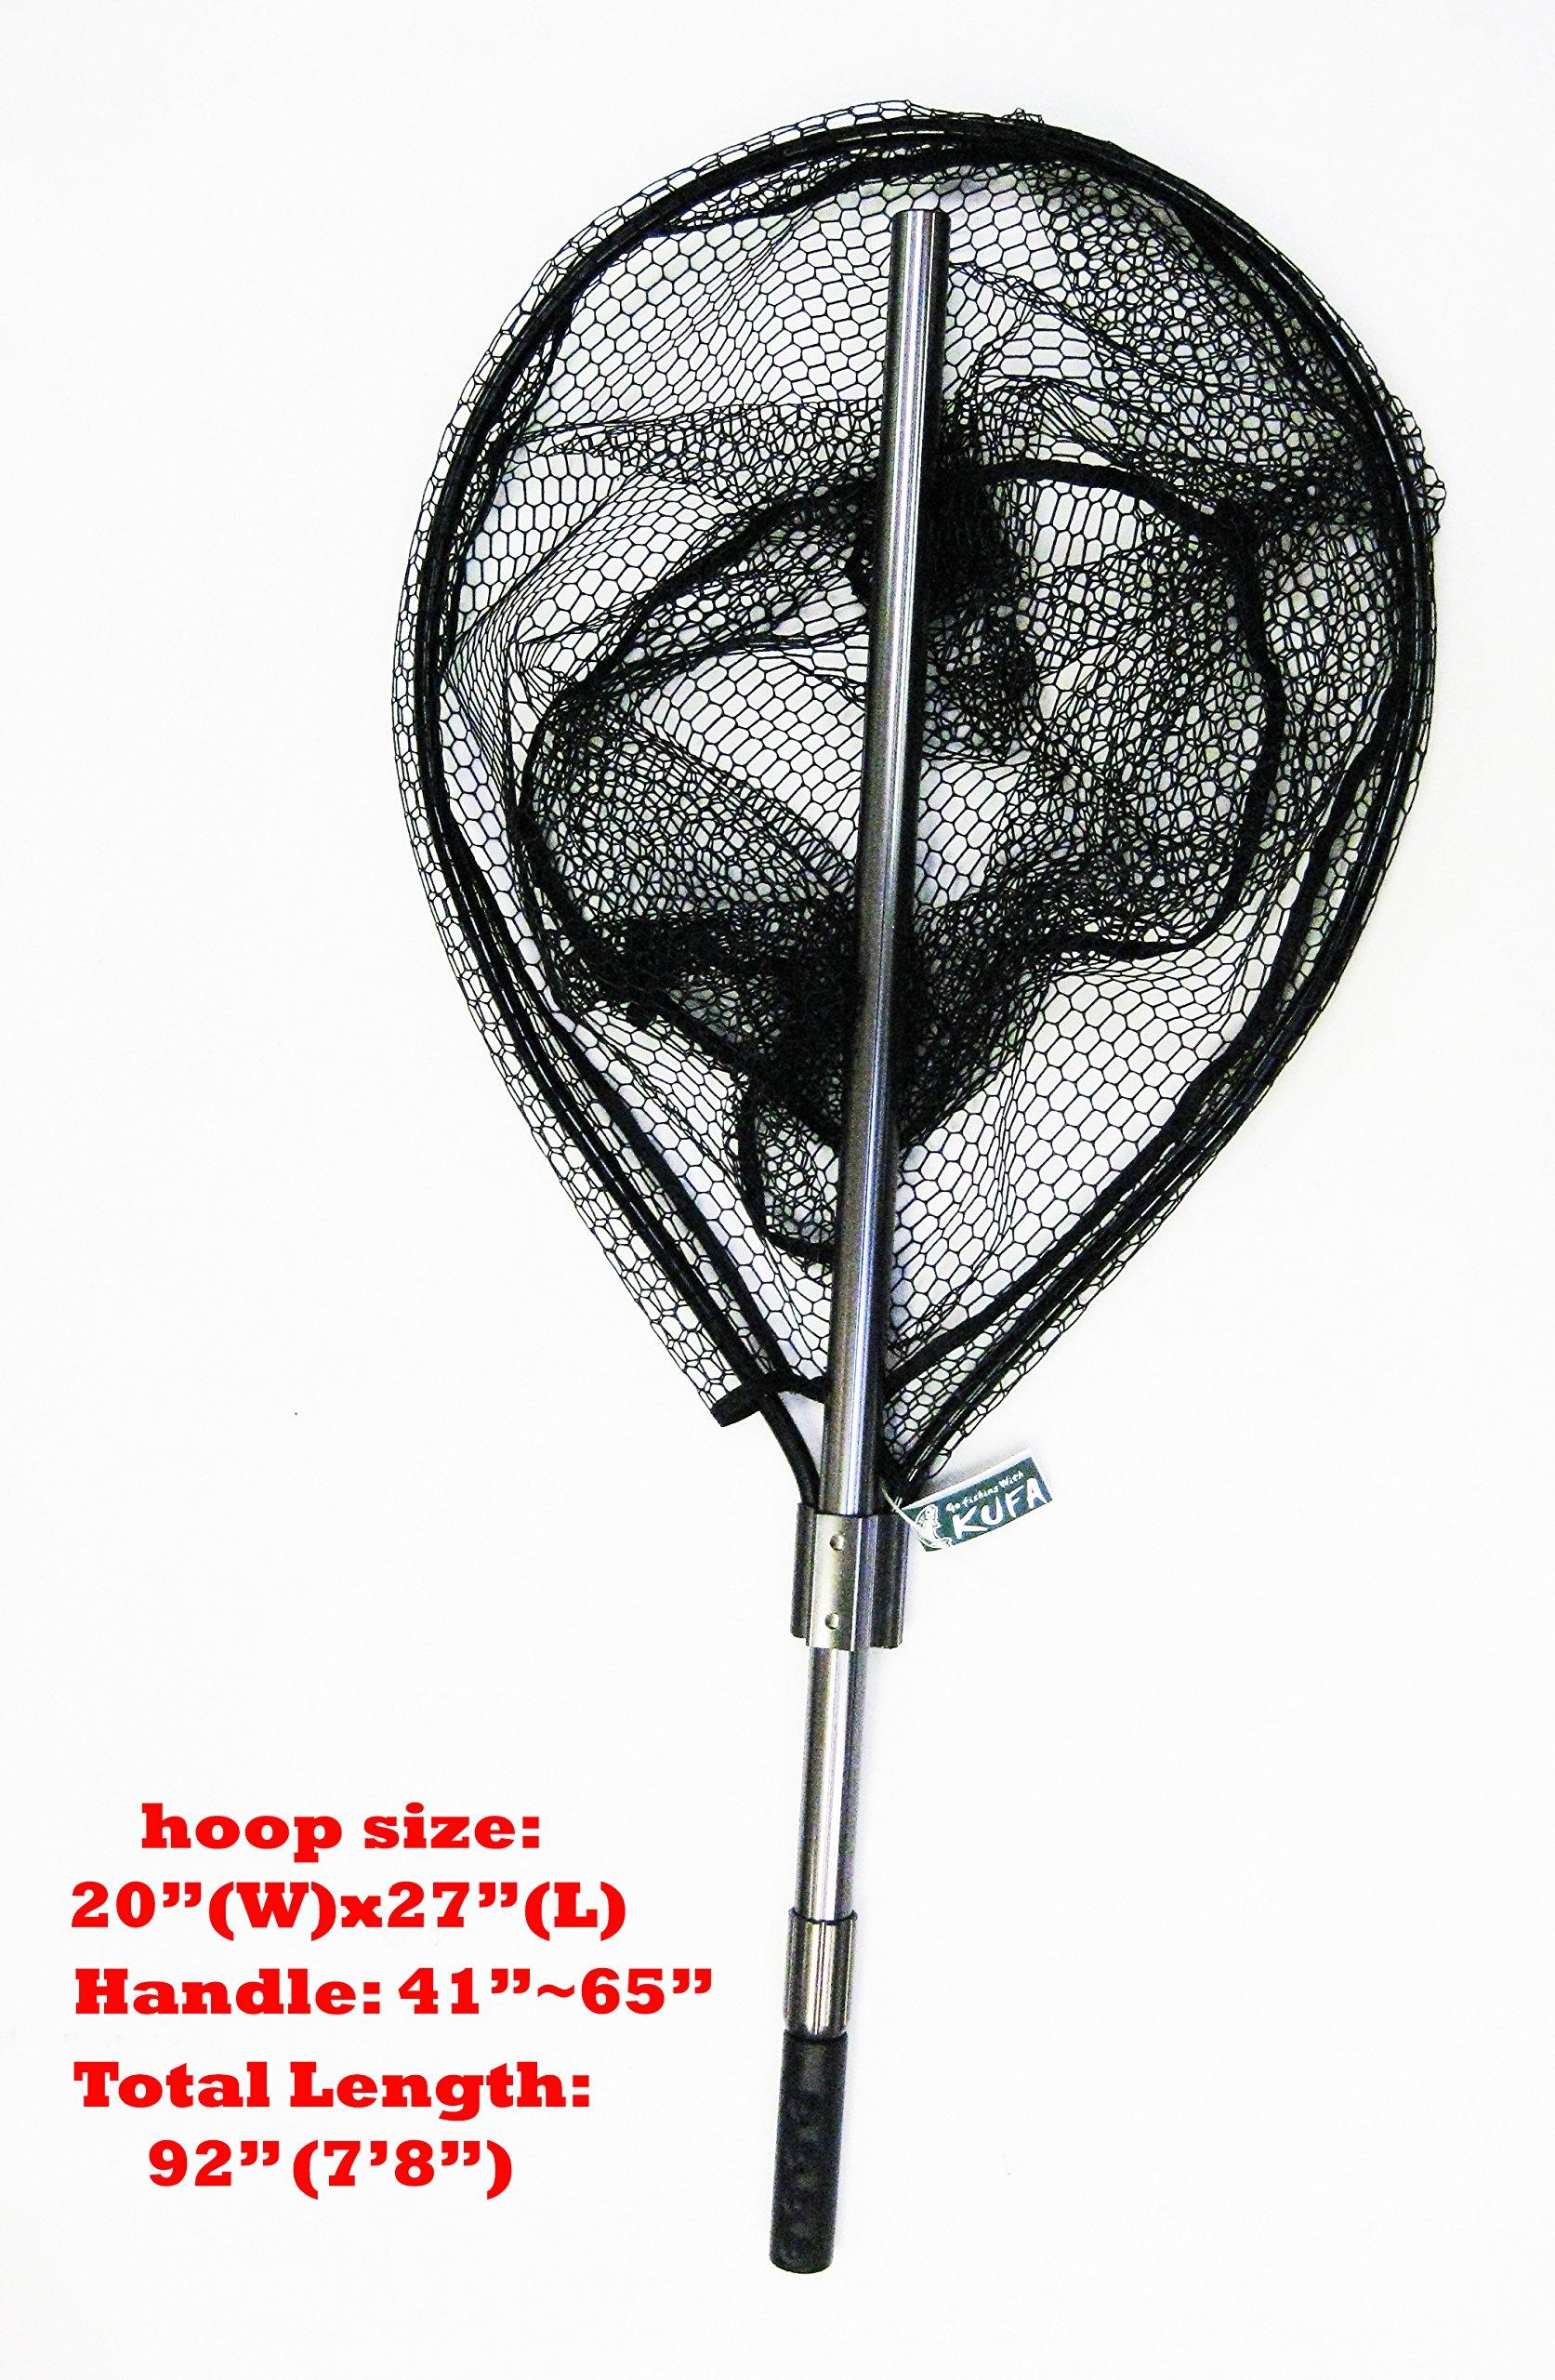 KUFA SPORTS FC7052 Retractable Aluminum Landing Net with Rubberized Mesh, 20 x 27/41-65''/22''